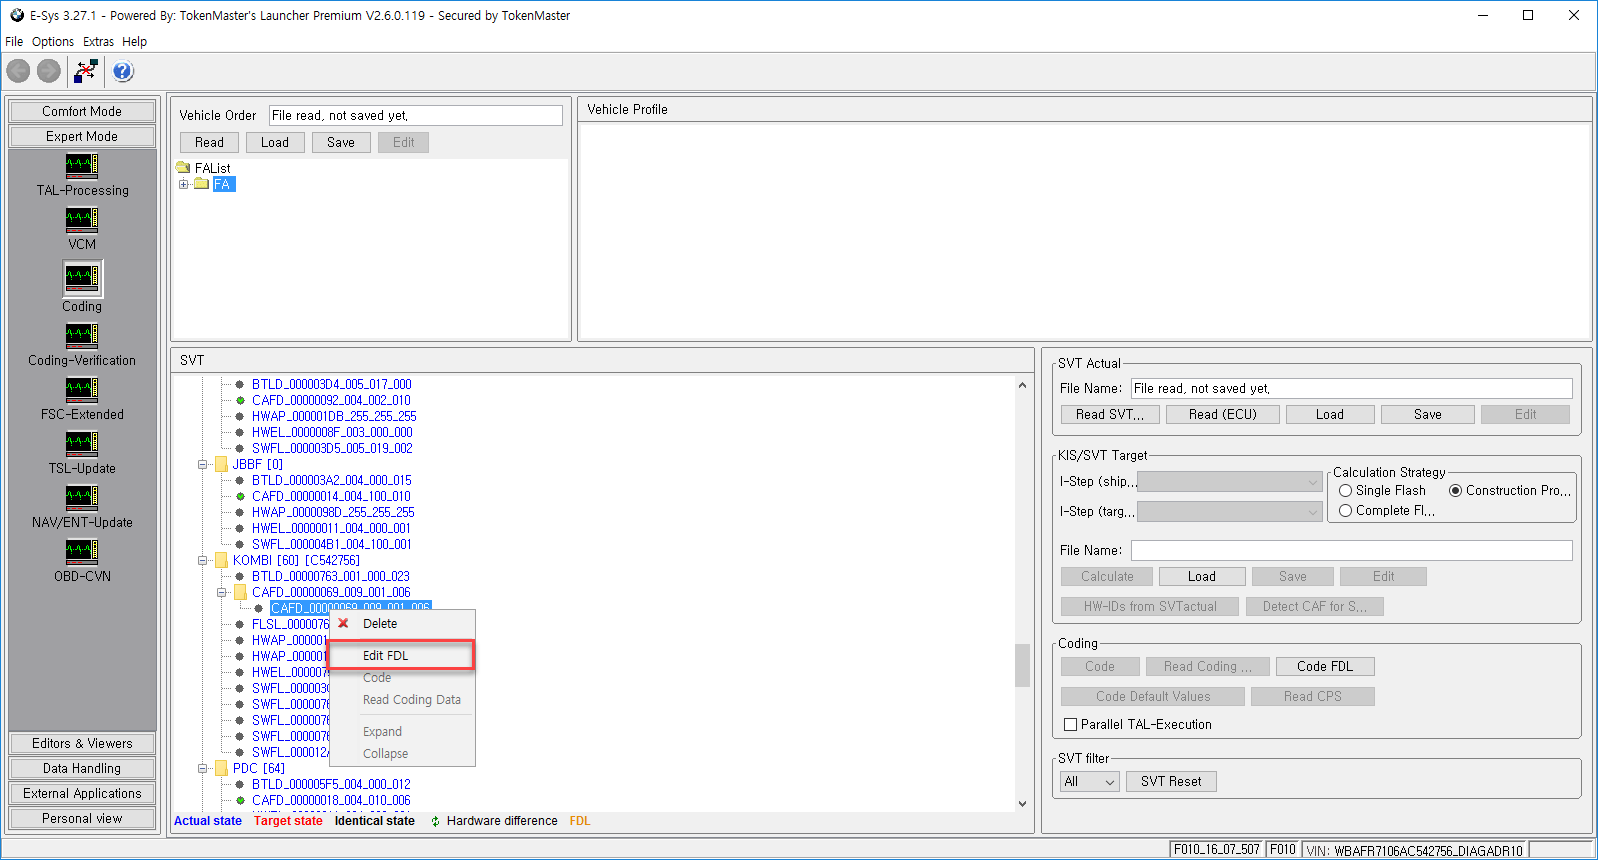 bmw-f15-x5-fdl-coding-by-bmw-esys-bmw-enet-cable-6